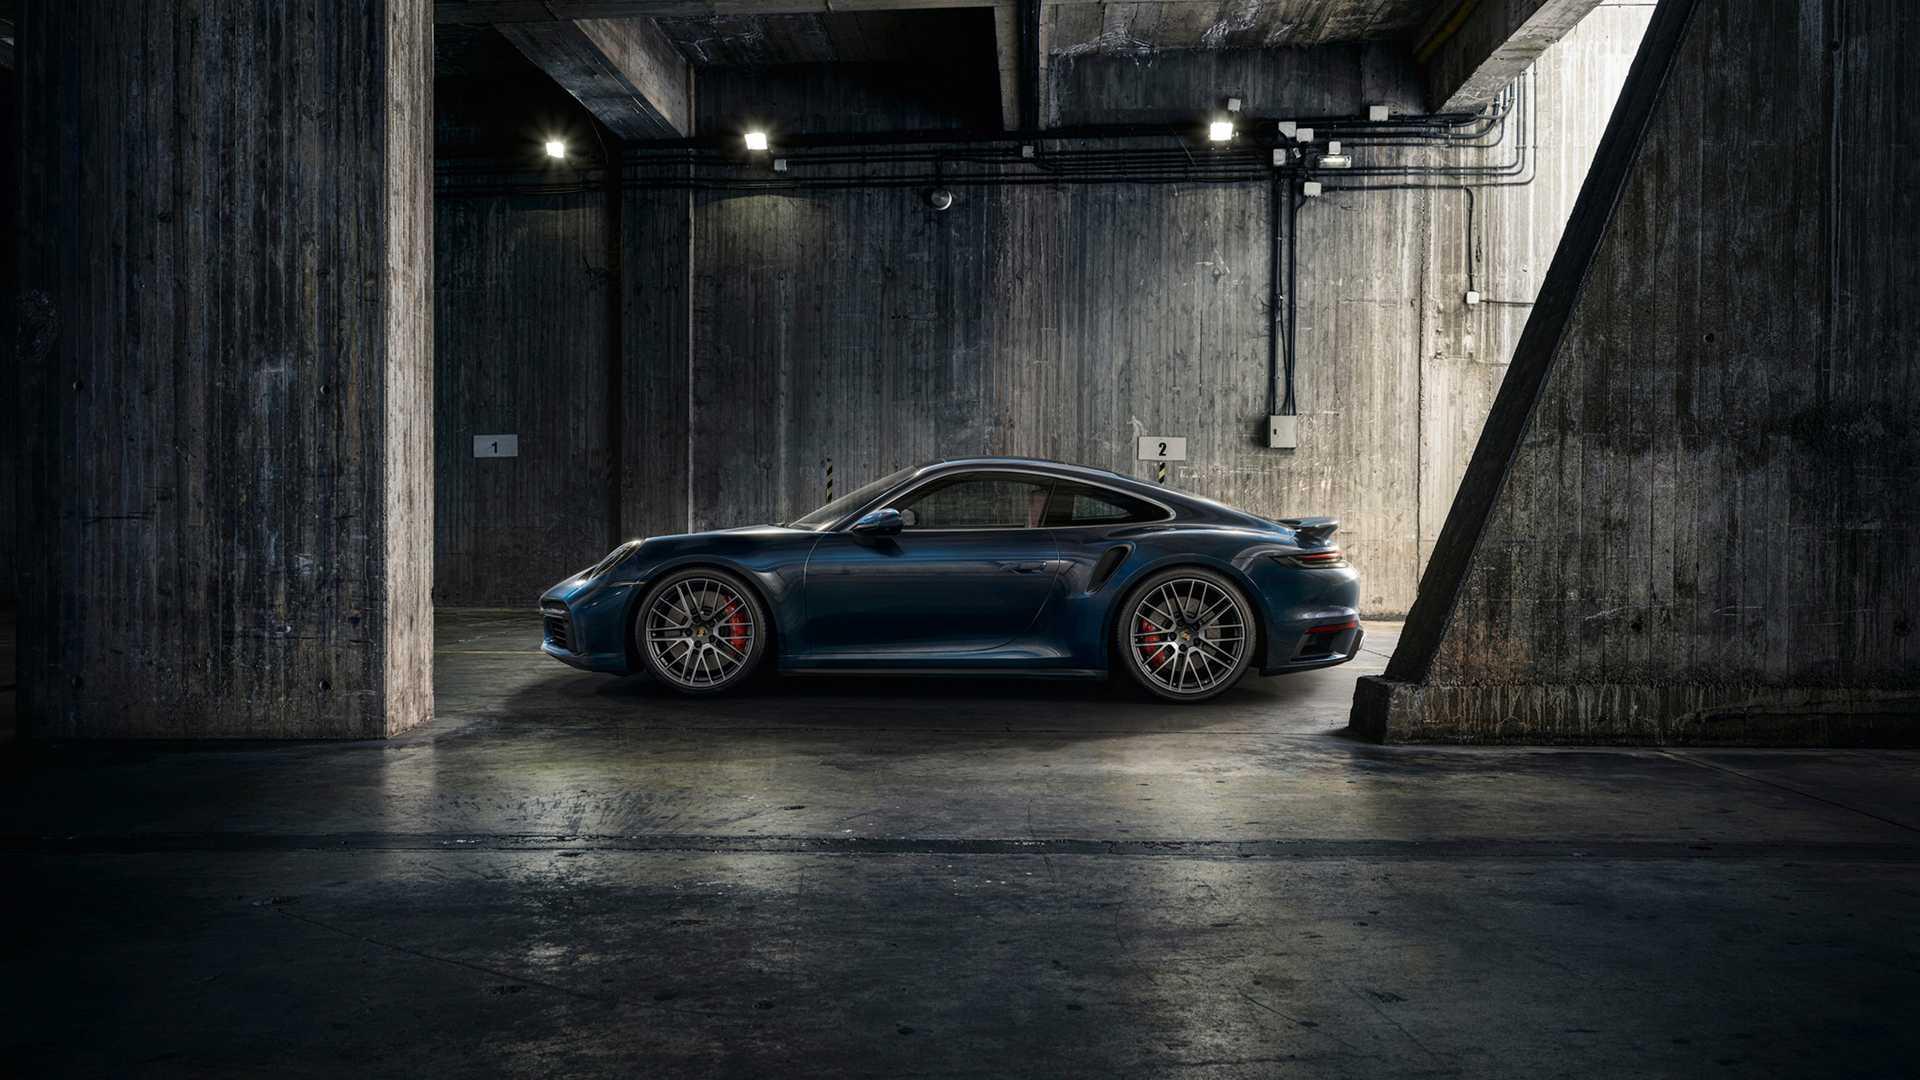 2021-porsche-911-turbo-coupe (3)